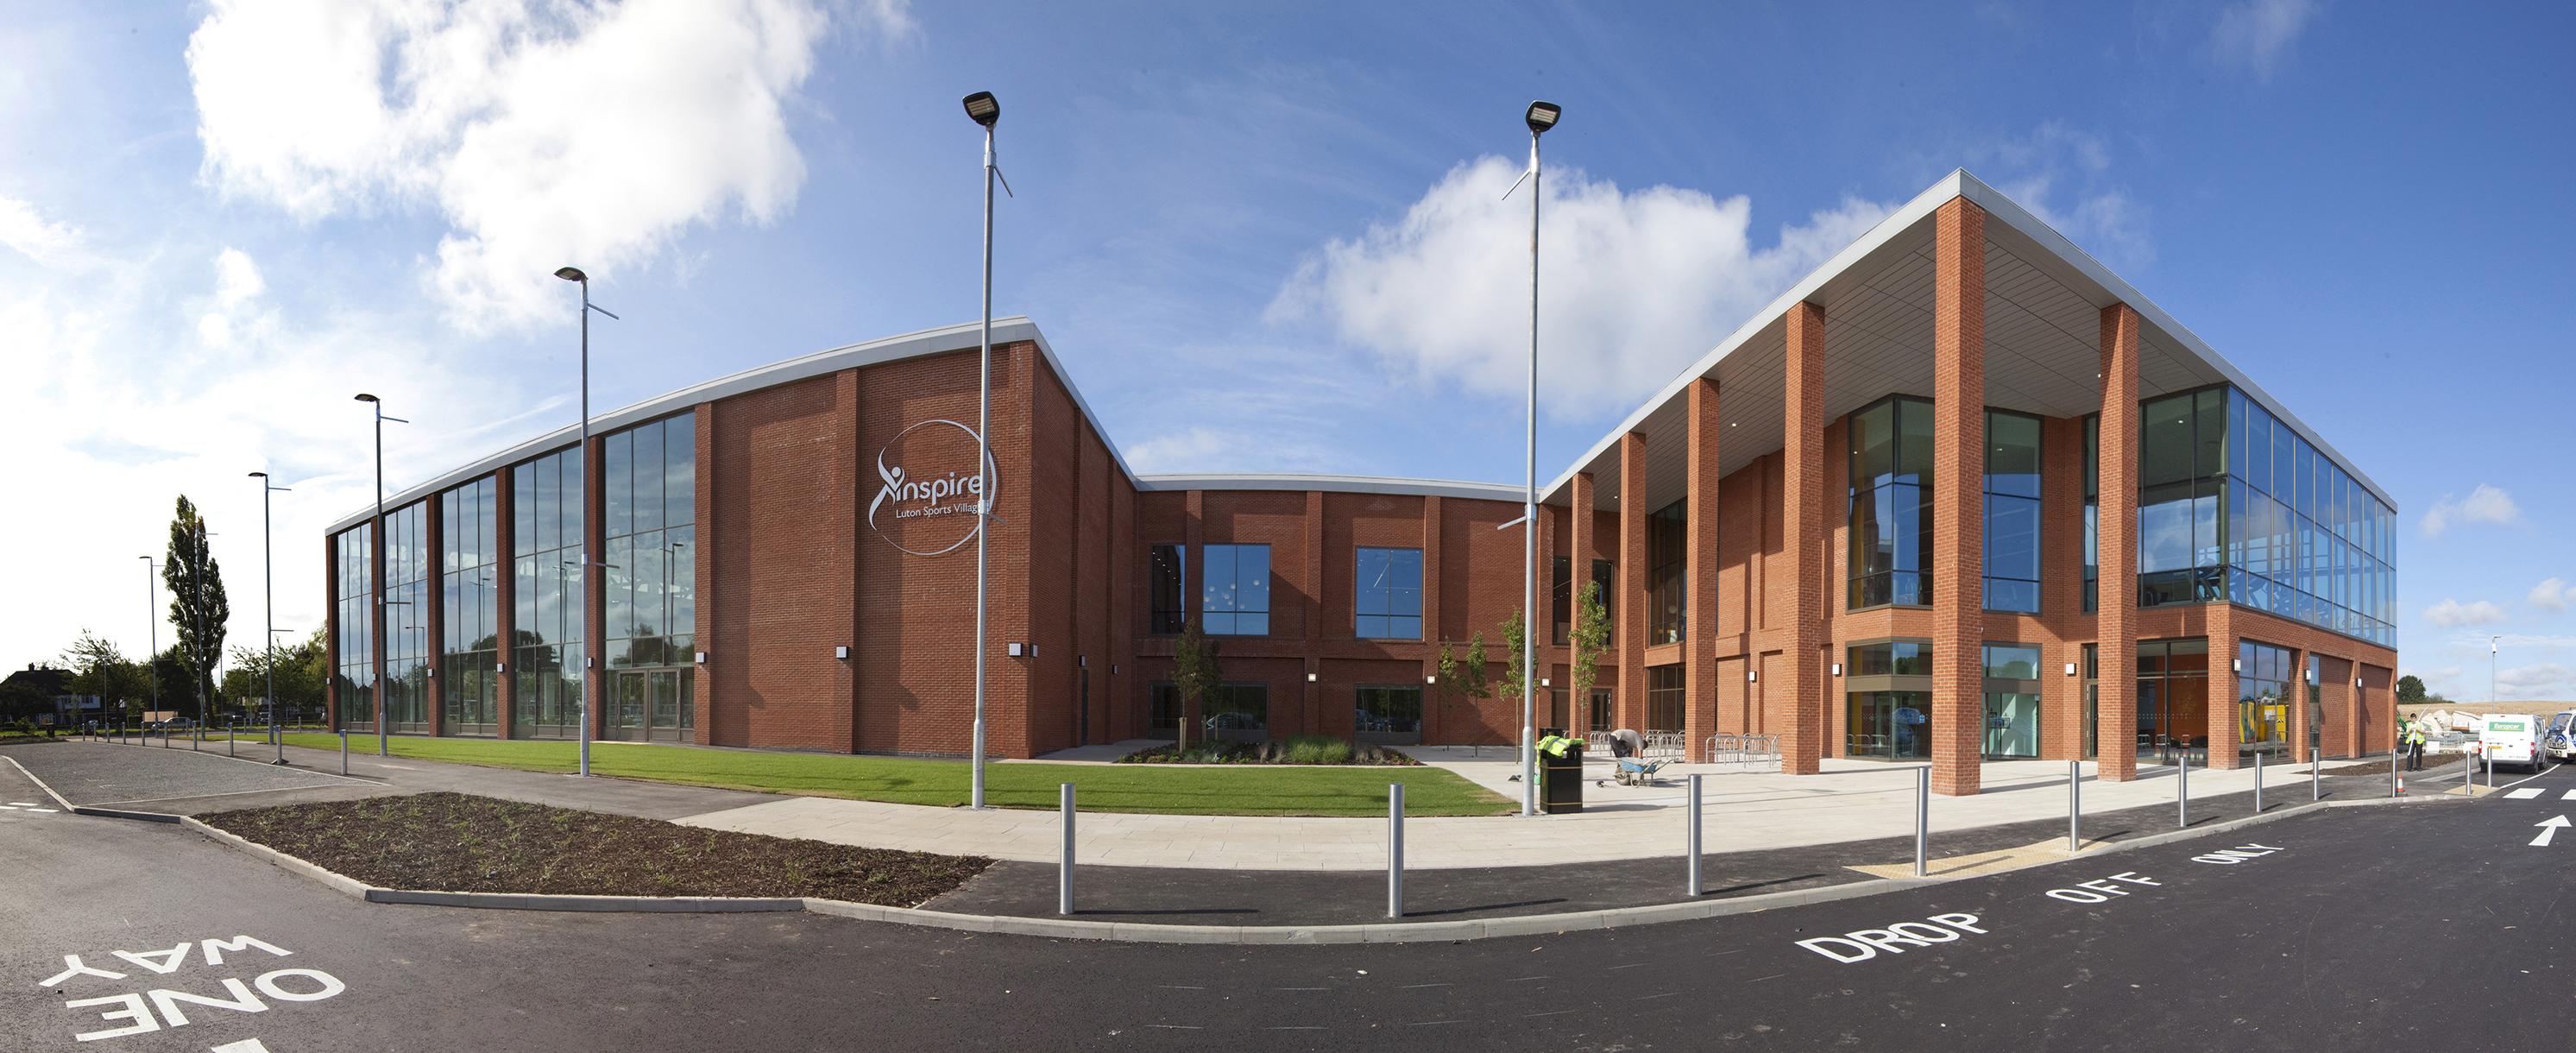 Luton Aquatic Centre